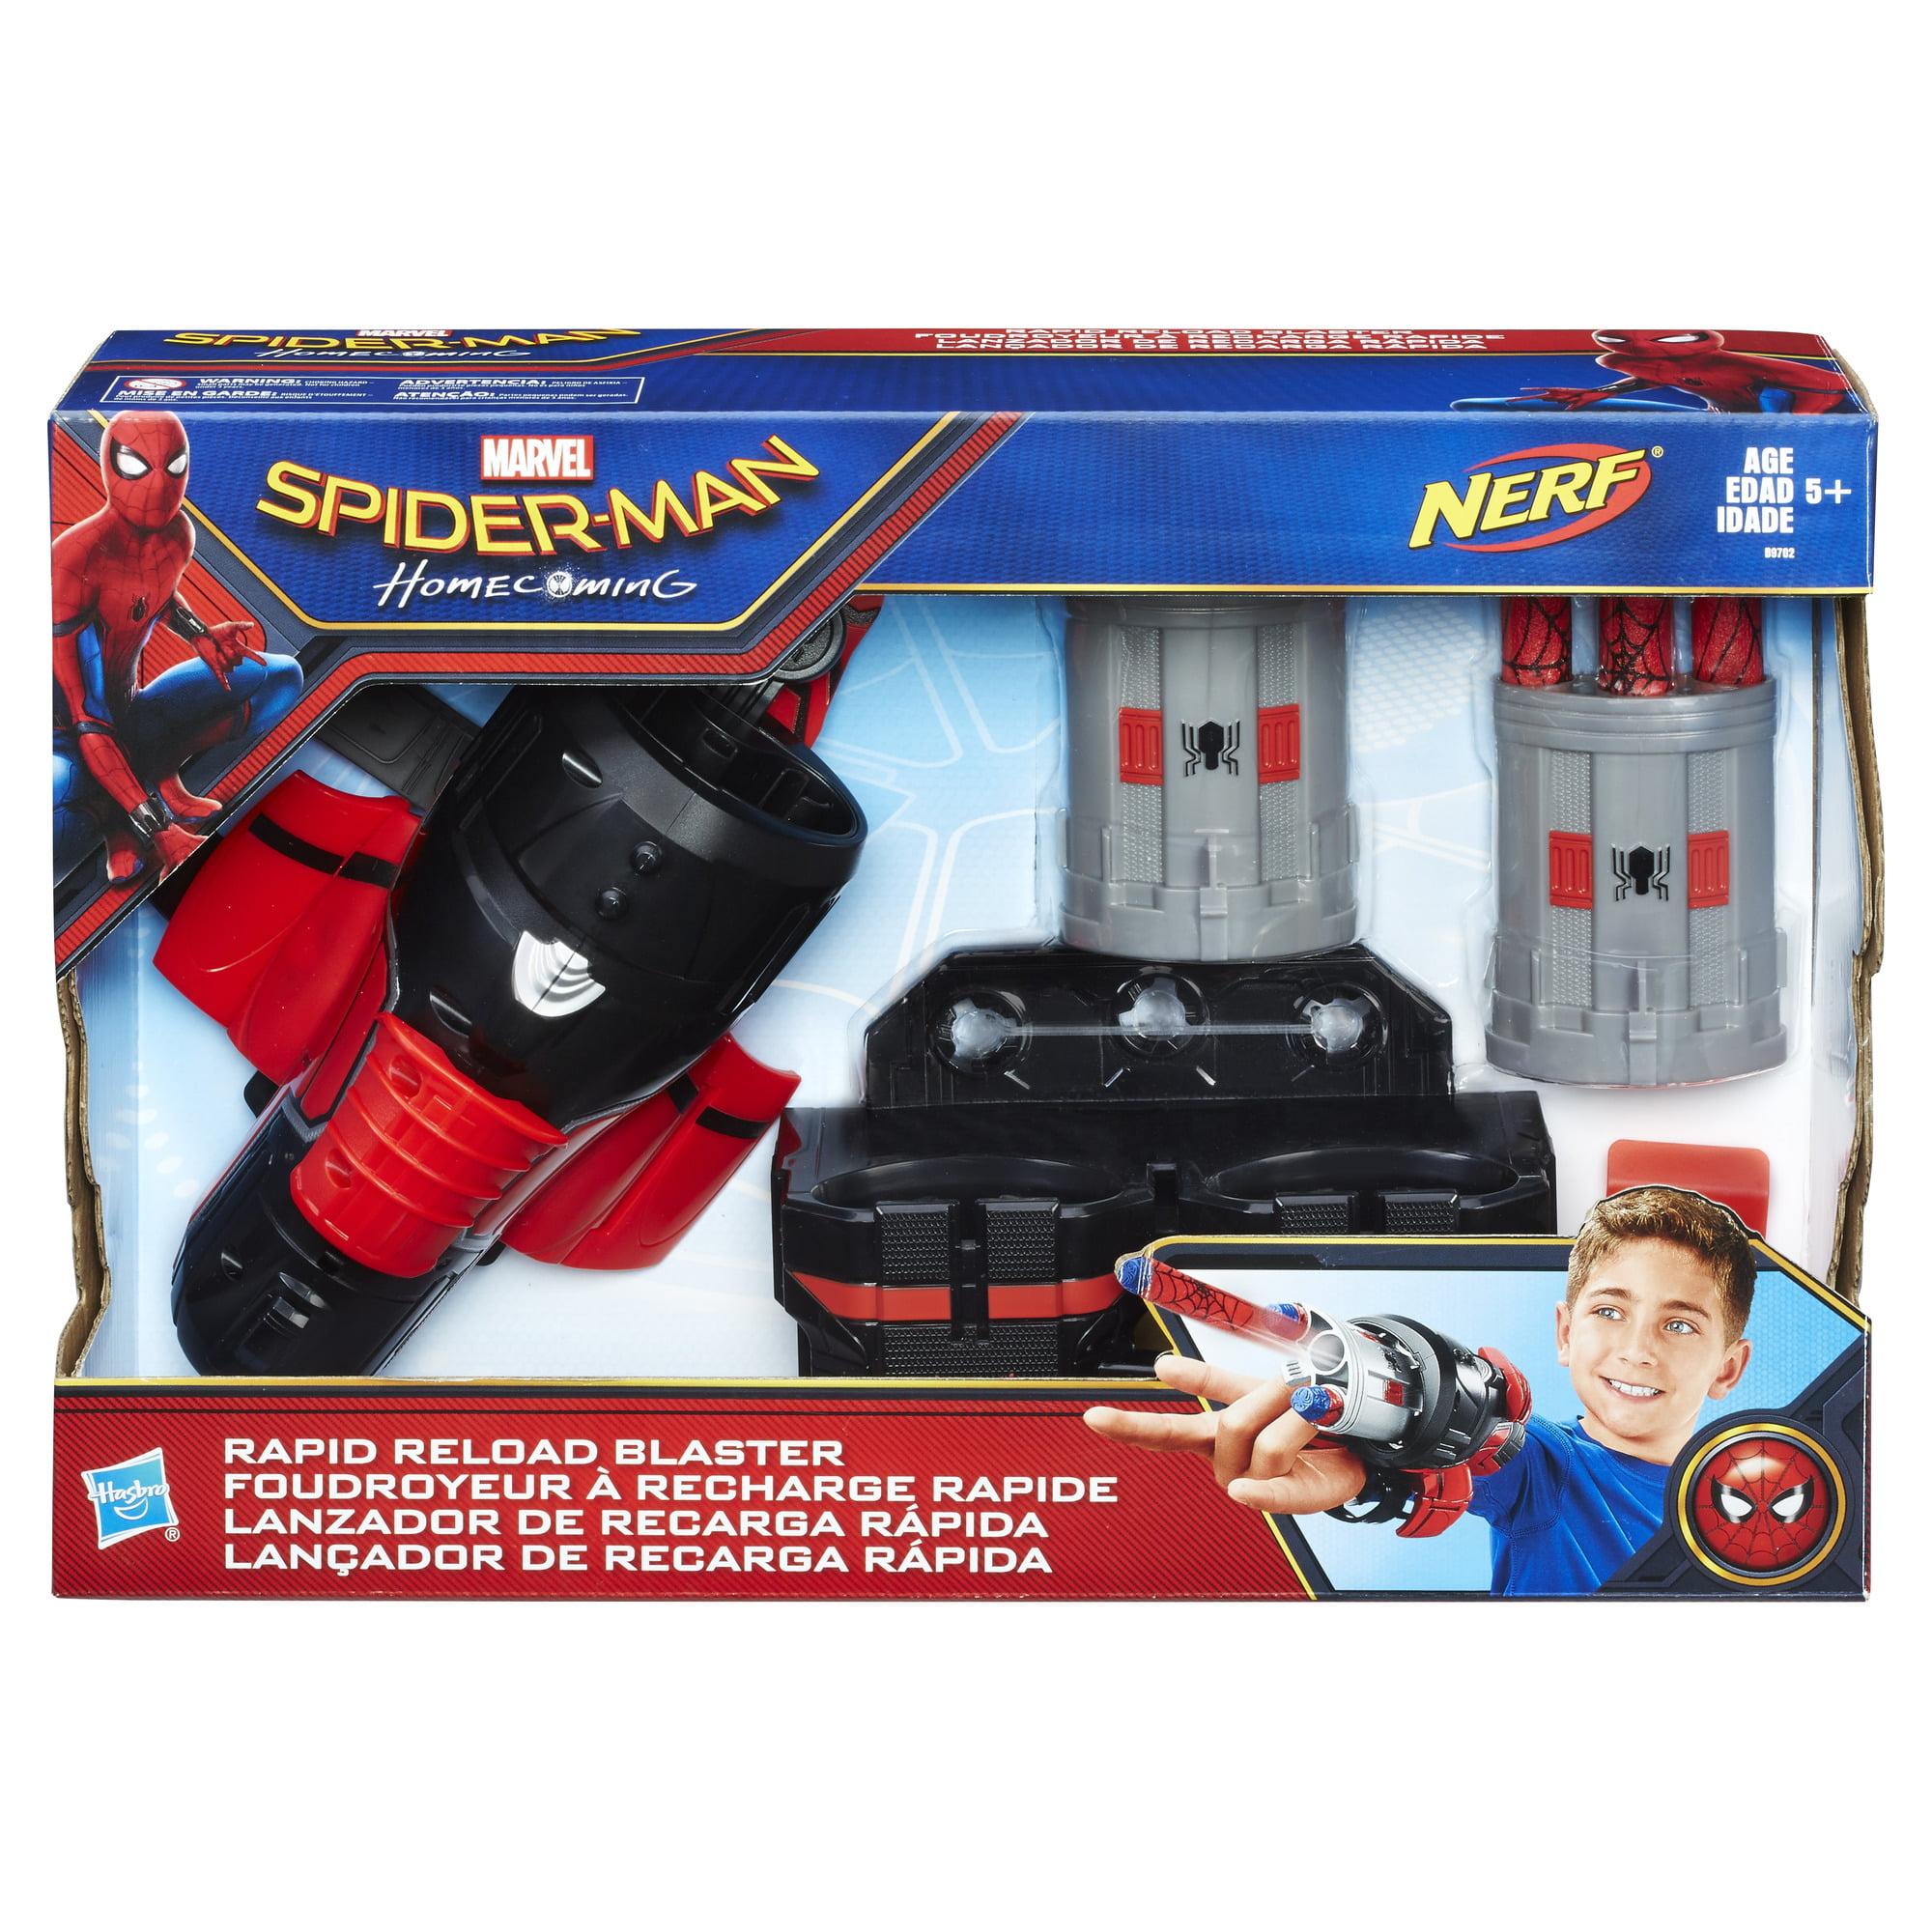 Spider man Nerf Blaster New